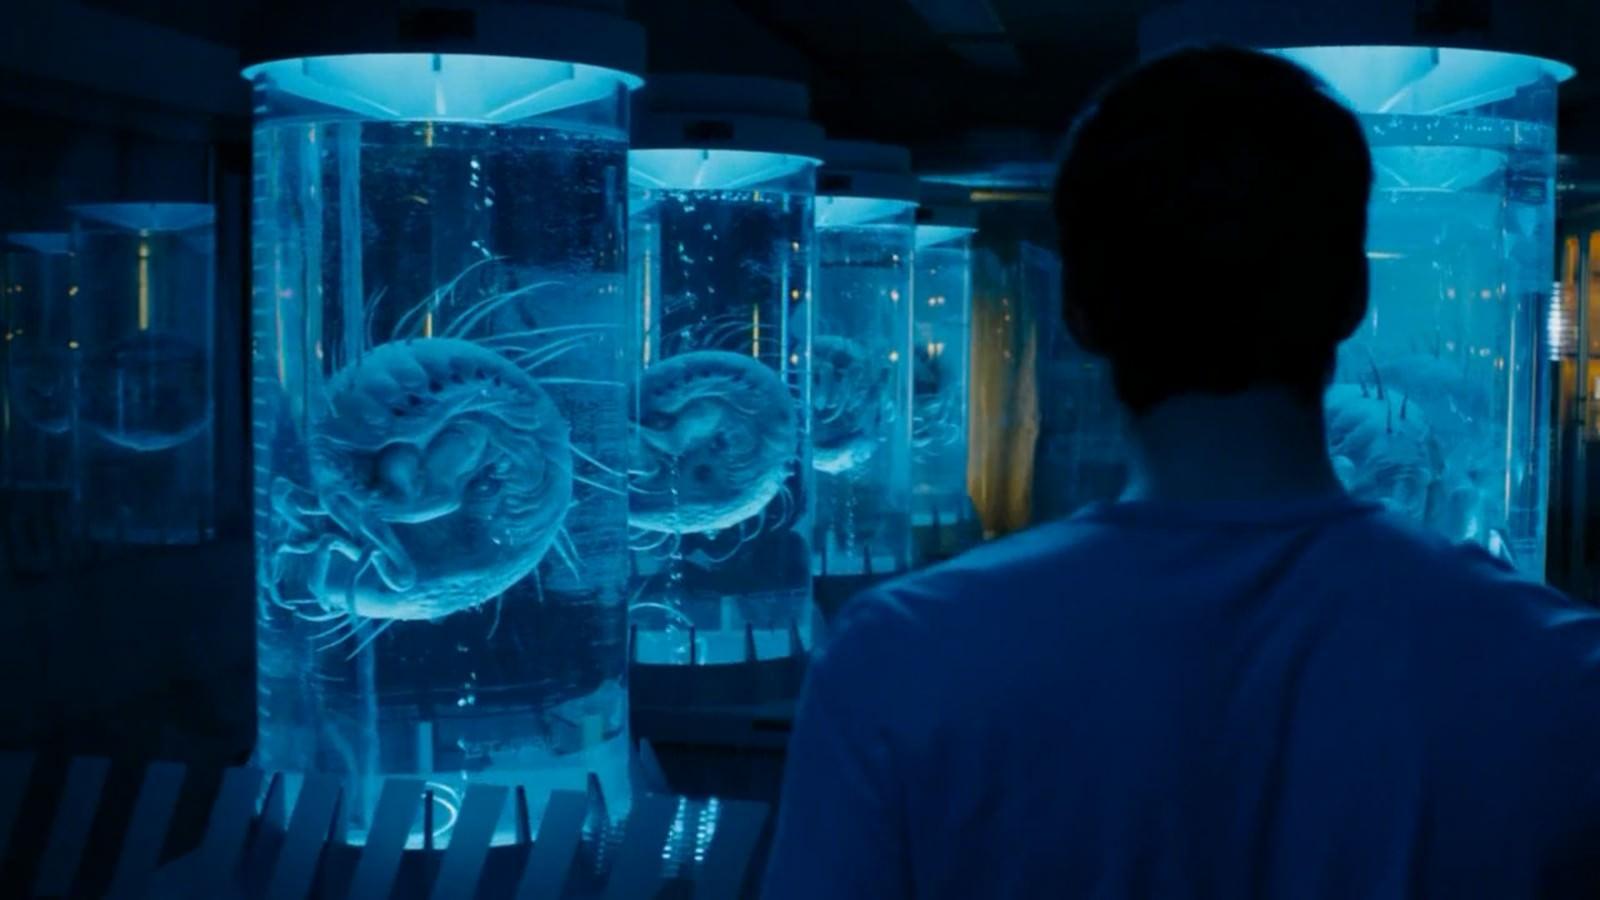 Movie, Maze Runner: The Scorch Trials(美國, 2015) / 移動迷宮:焦土試煉(台灣.香港) / 移动迷宫2(中國), 電影劇照